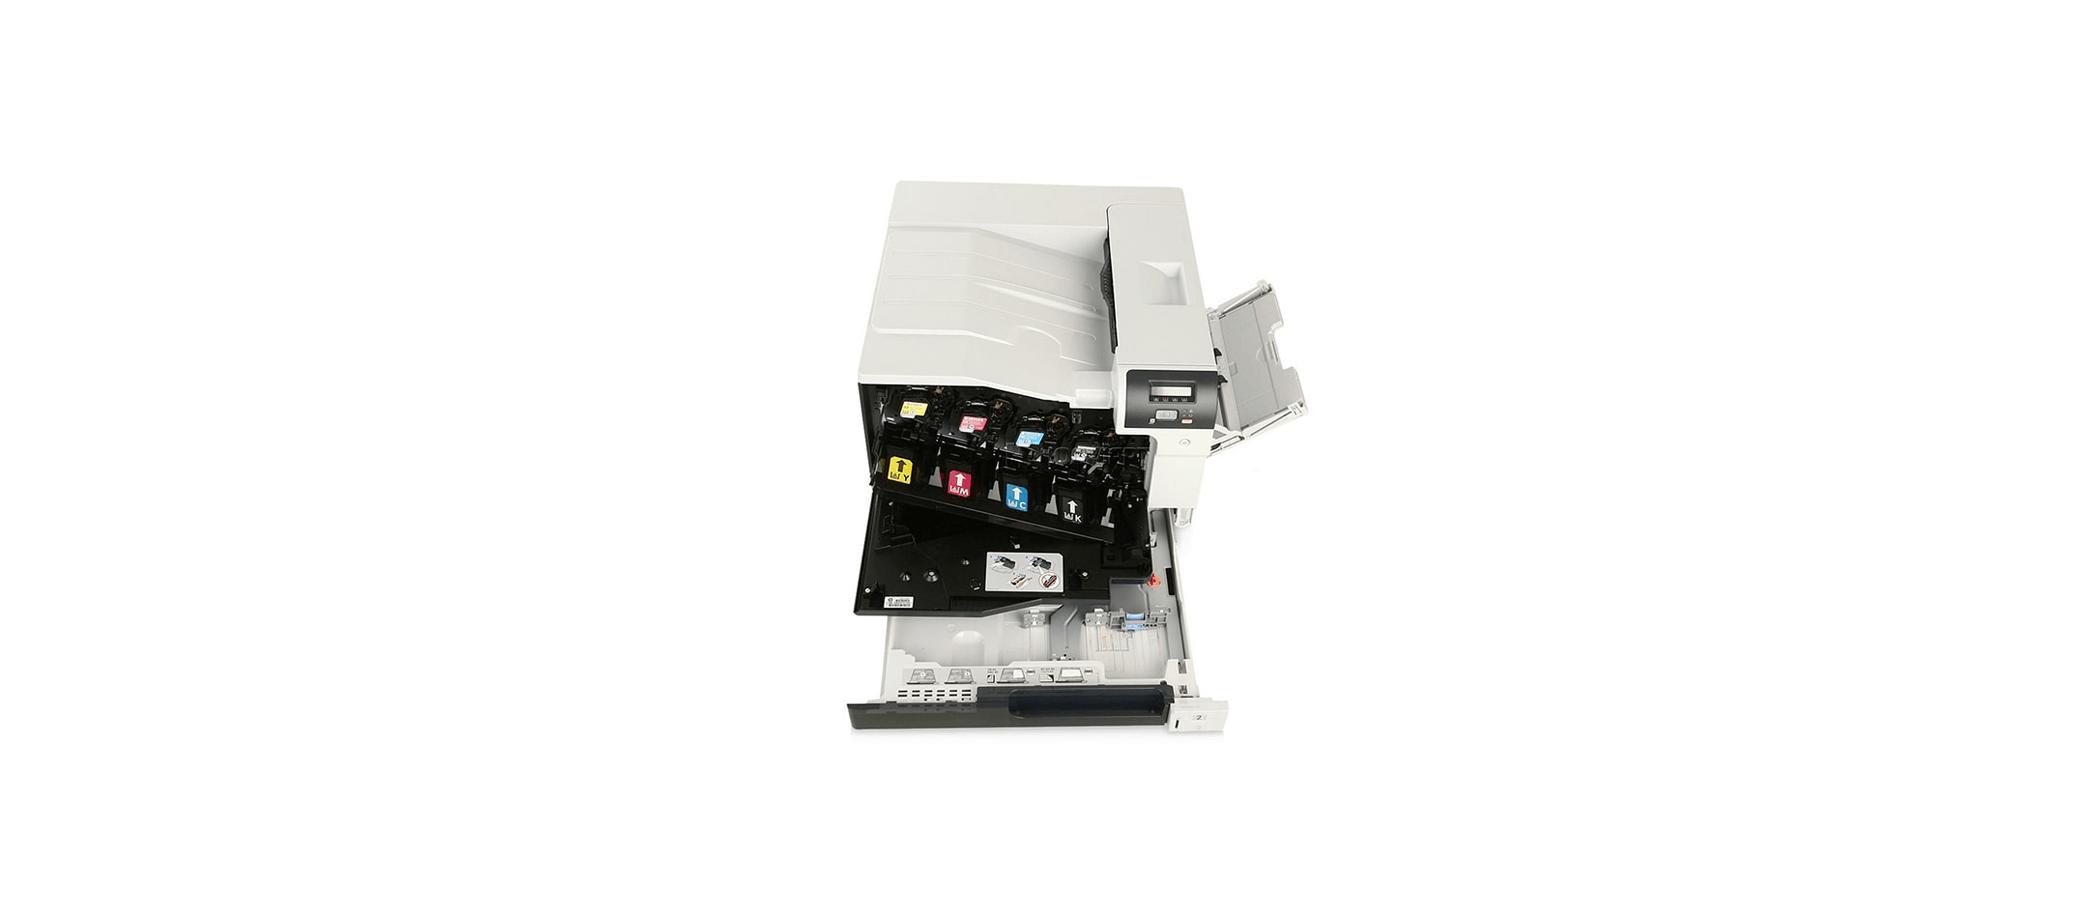 نحوه قرار گرفتن کارتریج ها در پرینتر اچ پی مدل 5225n لیزری و تک کاره رنگی